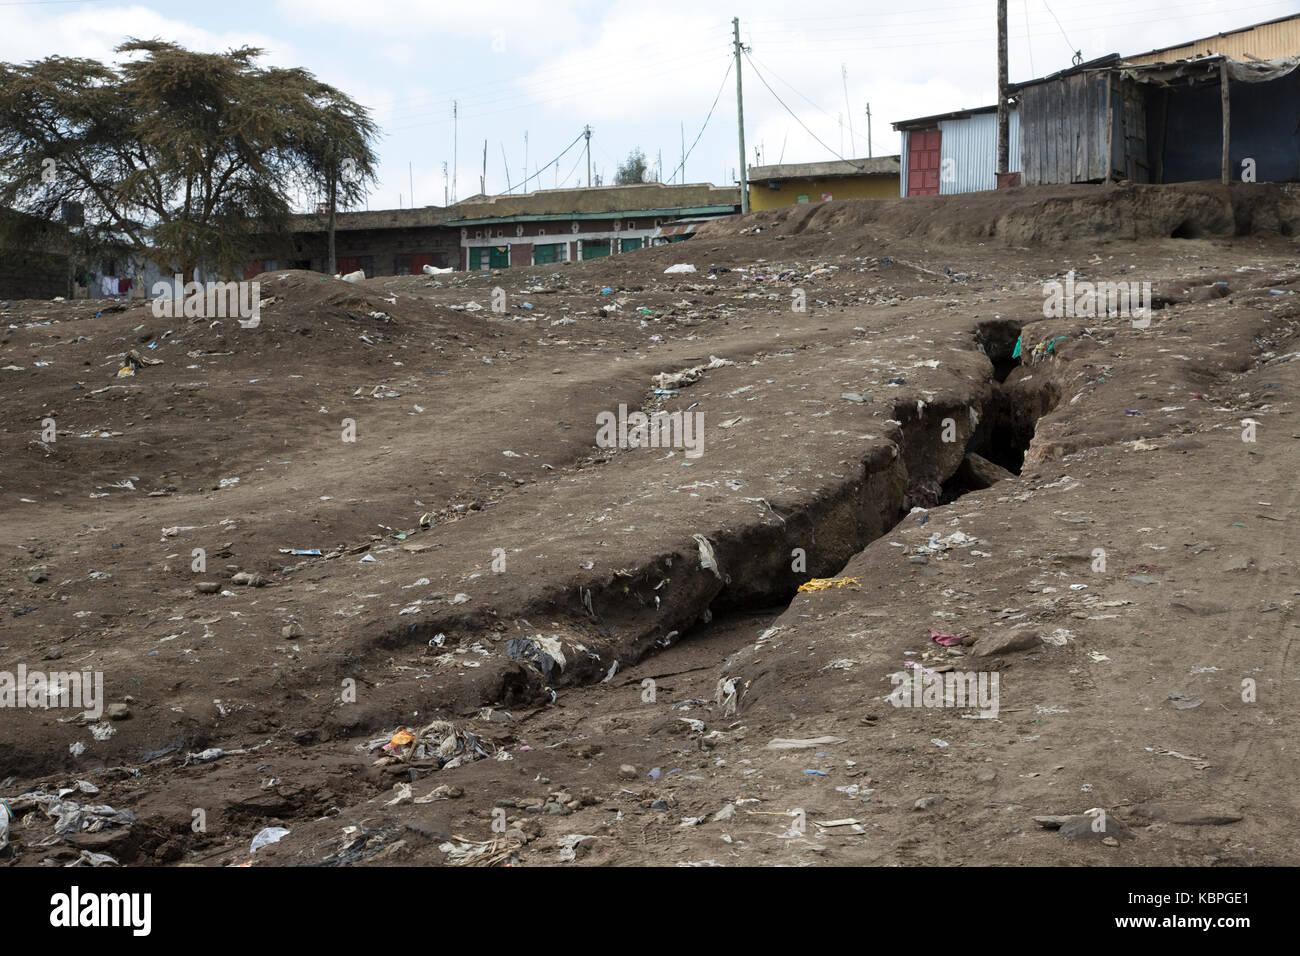 Erosion gully developing outside Kamere Township Kenya - Stock Image